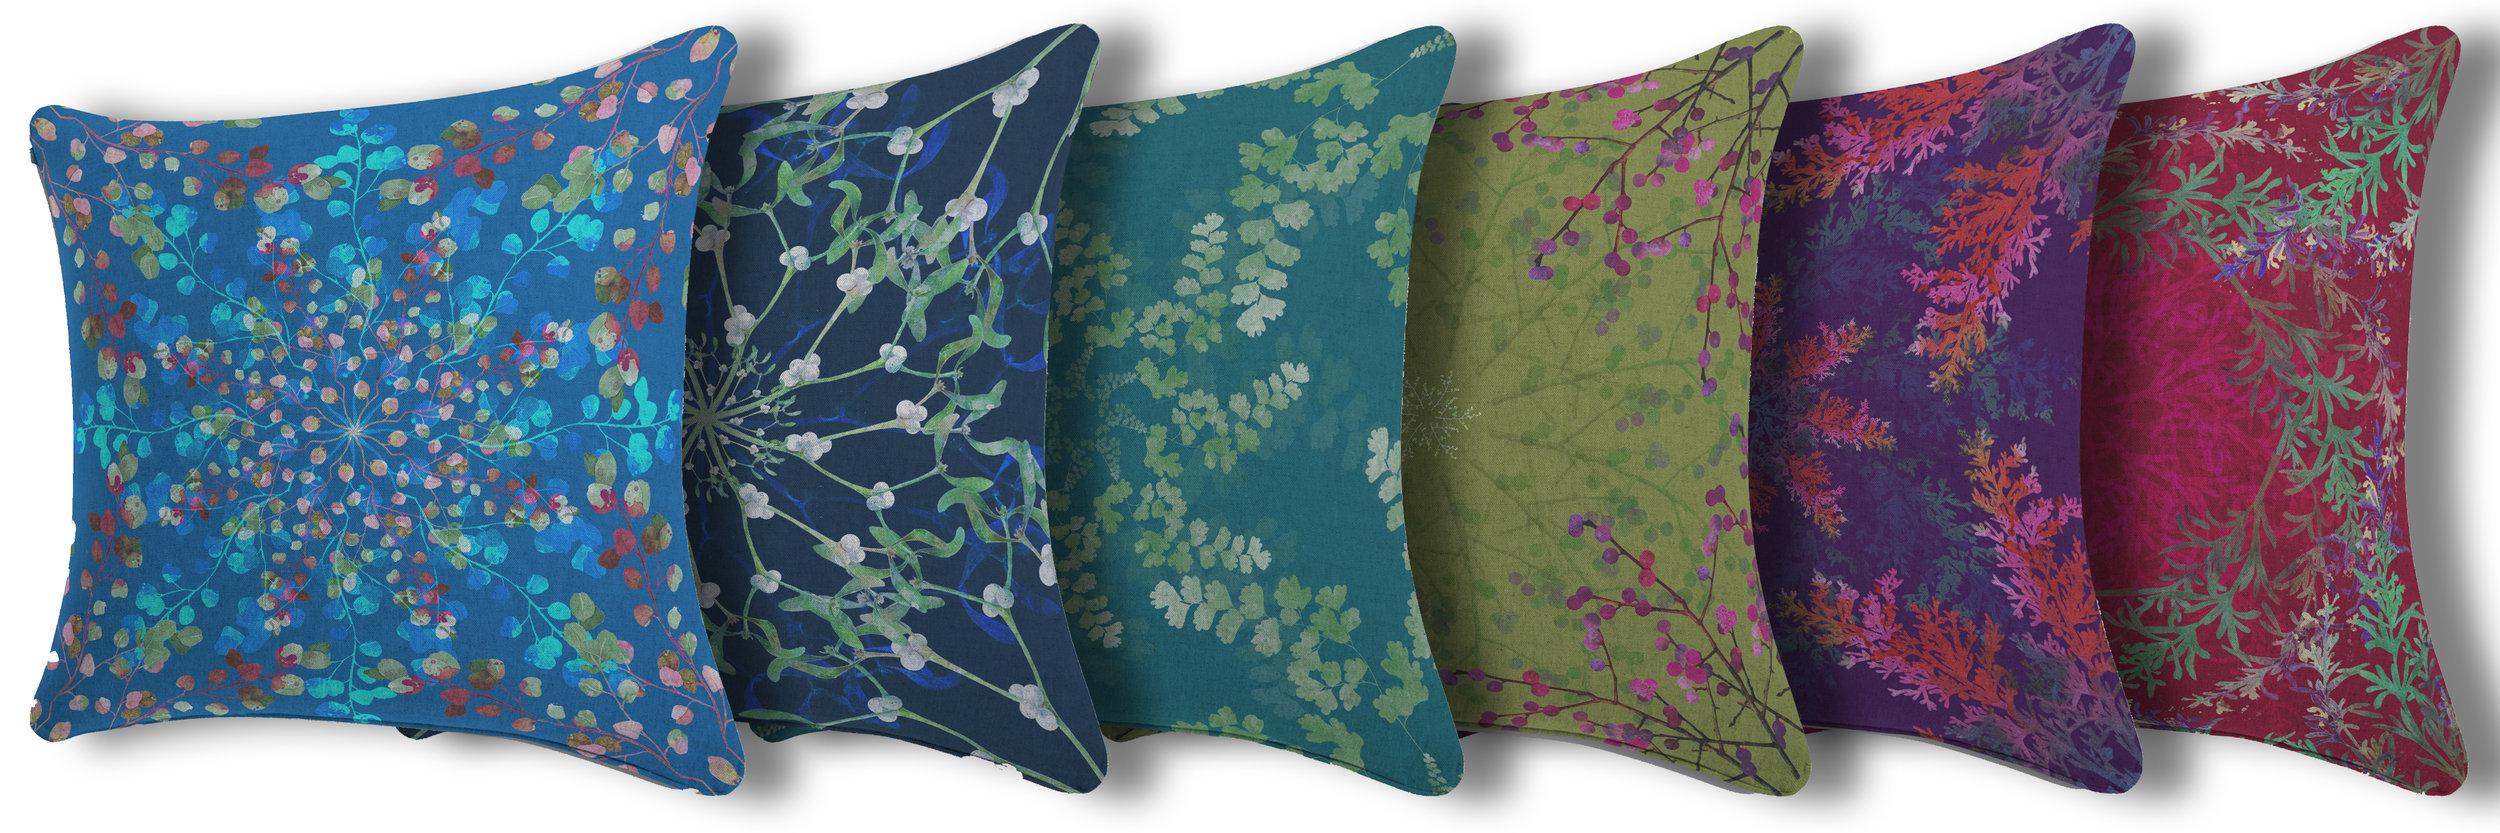 AW18 Cushions v2.jpg